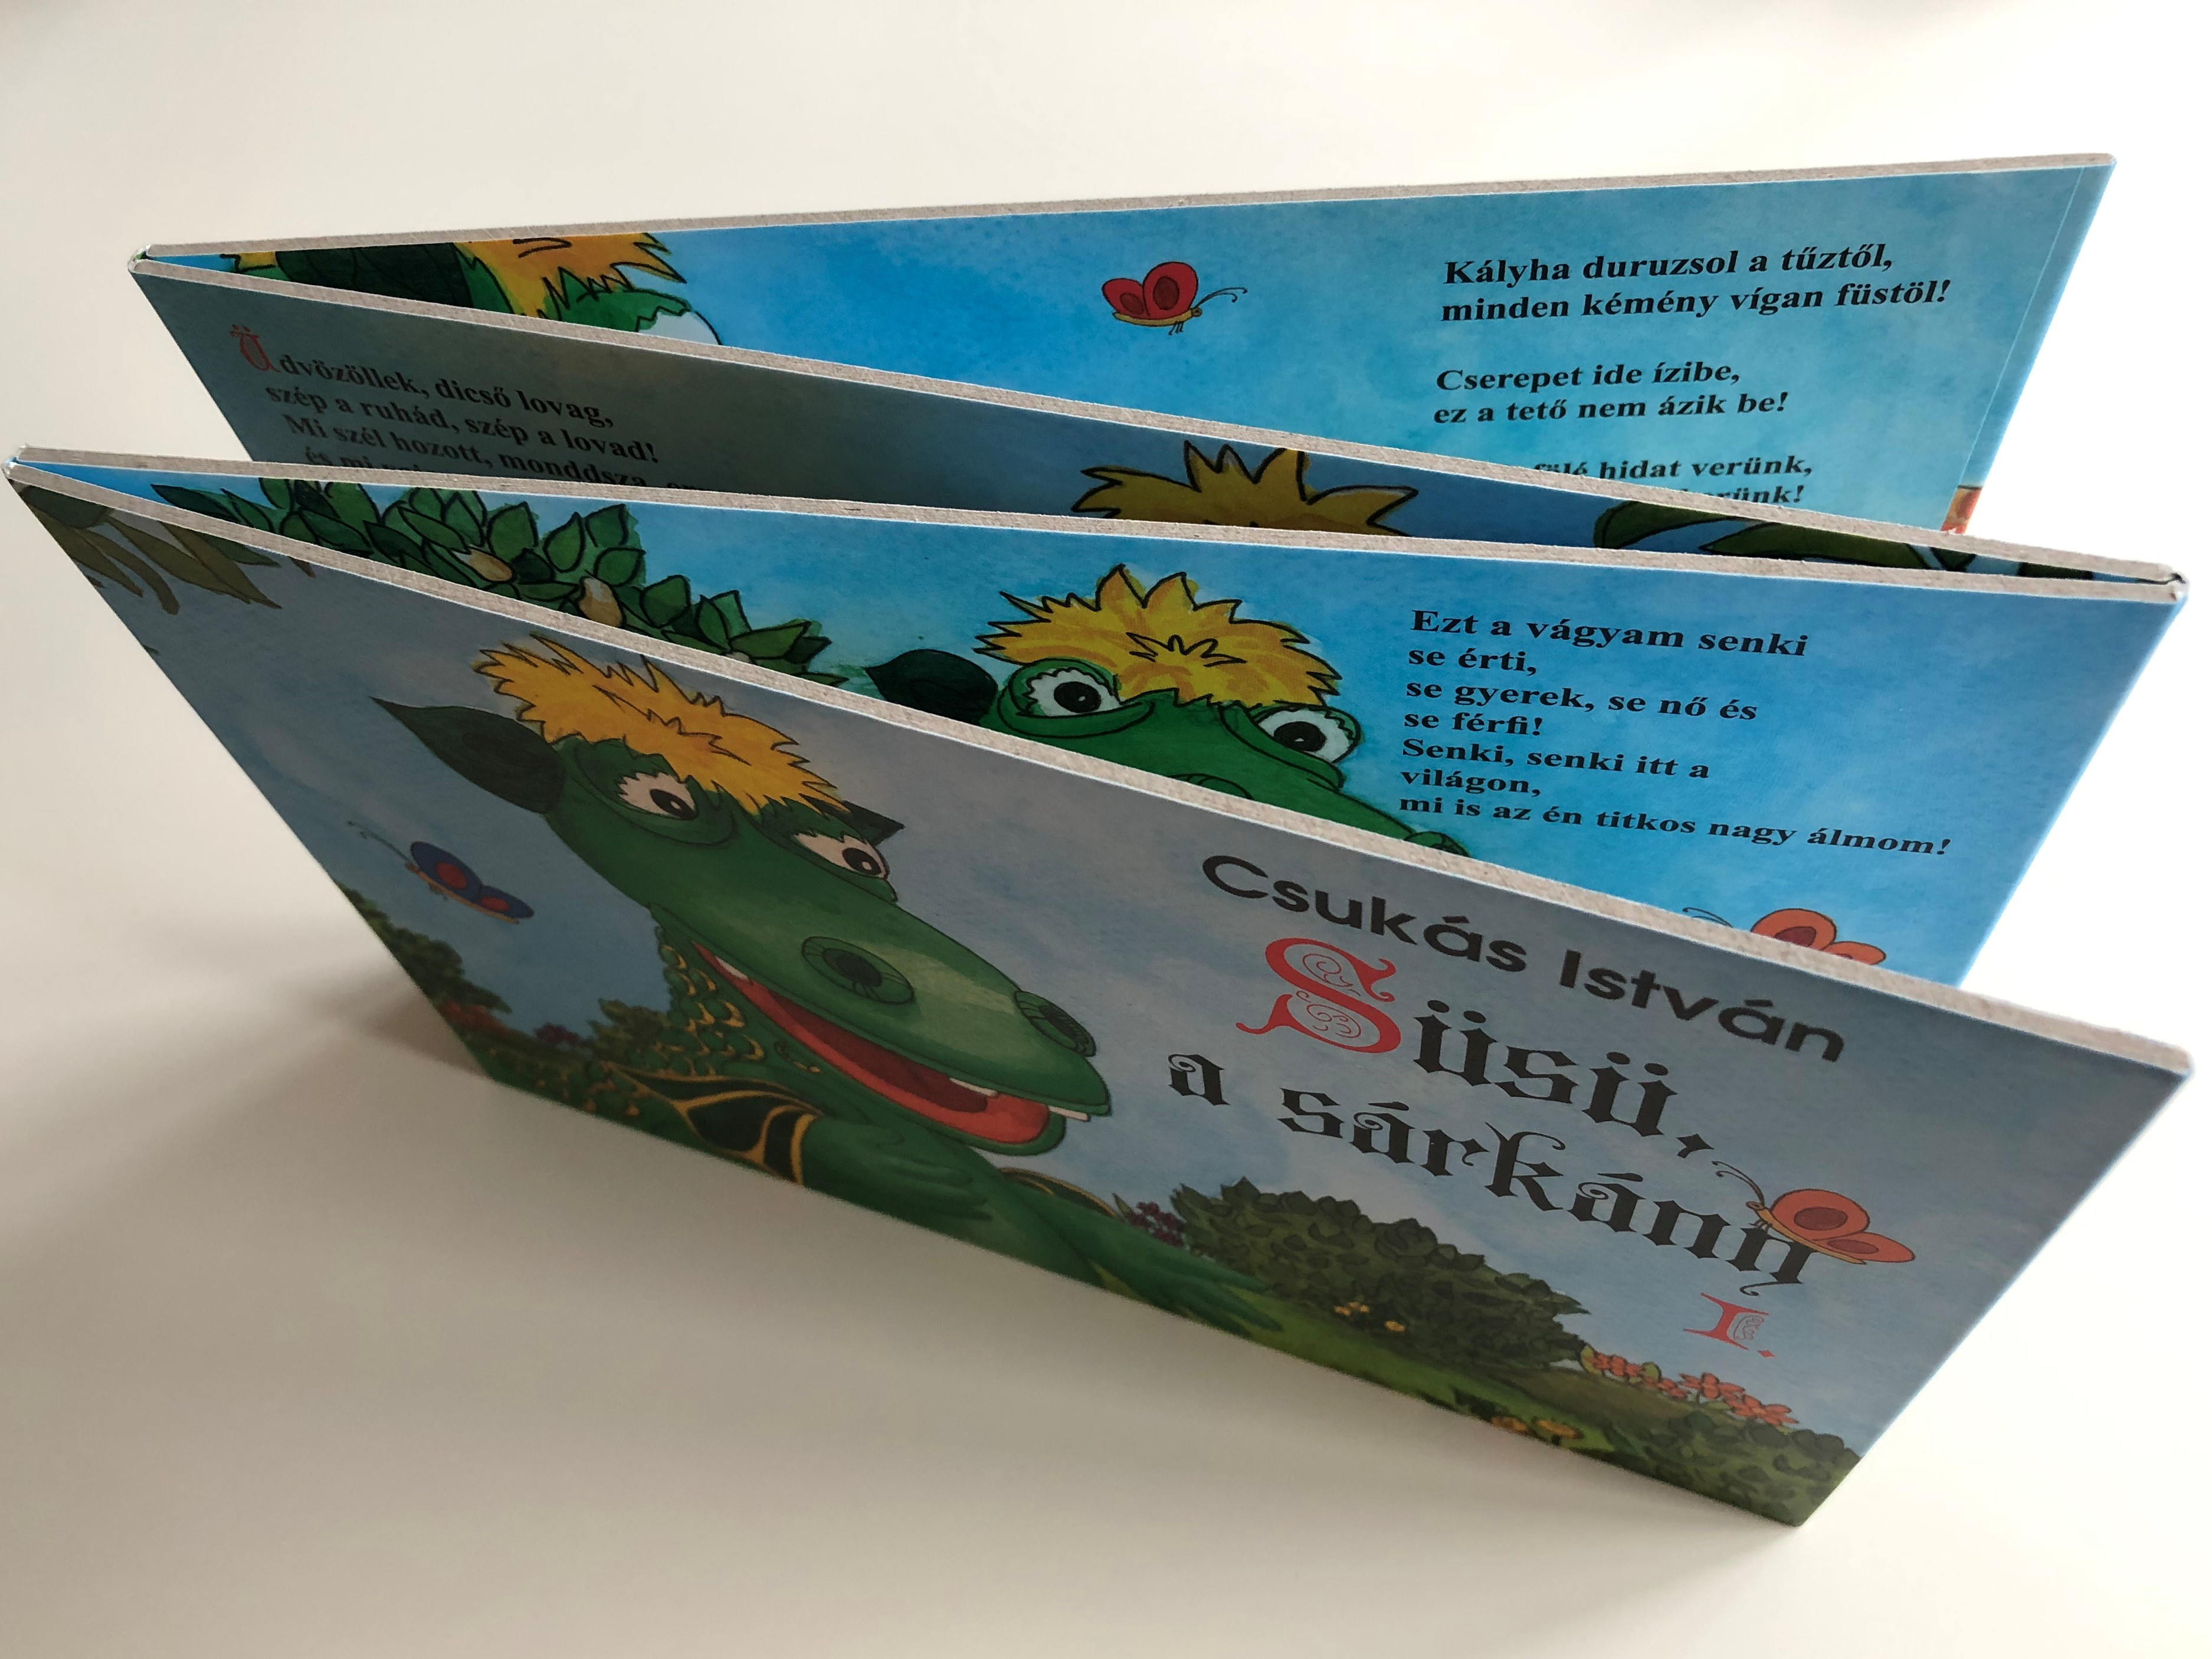 csuk-s-istv-n-s-s-a-s-rk-ny-i.-sz-nes-lapoz-2-ves-kort-l-s-s-the-dragon-hungarian-children-s-color-board-book-2017-k-nyvmolyk-pz-kiad-3-.jpg